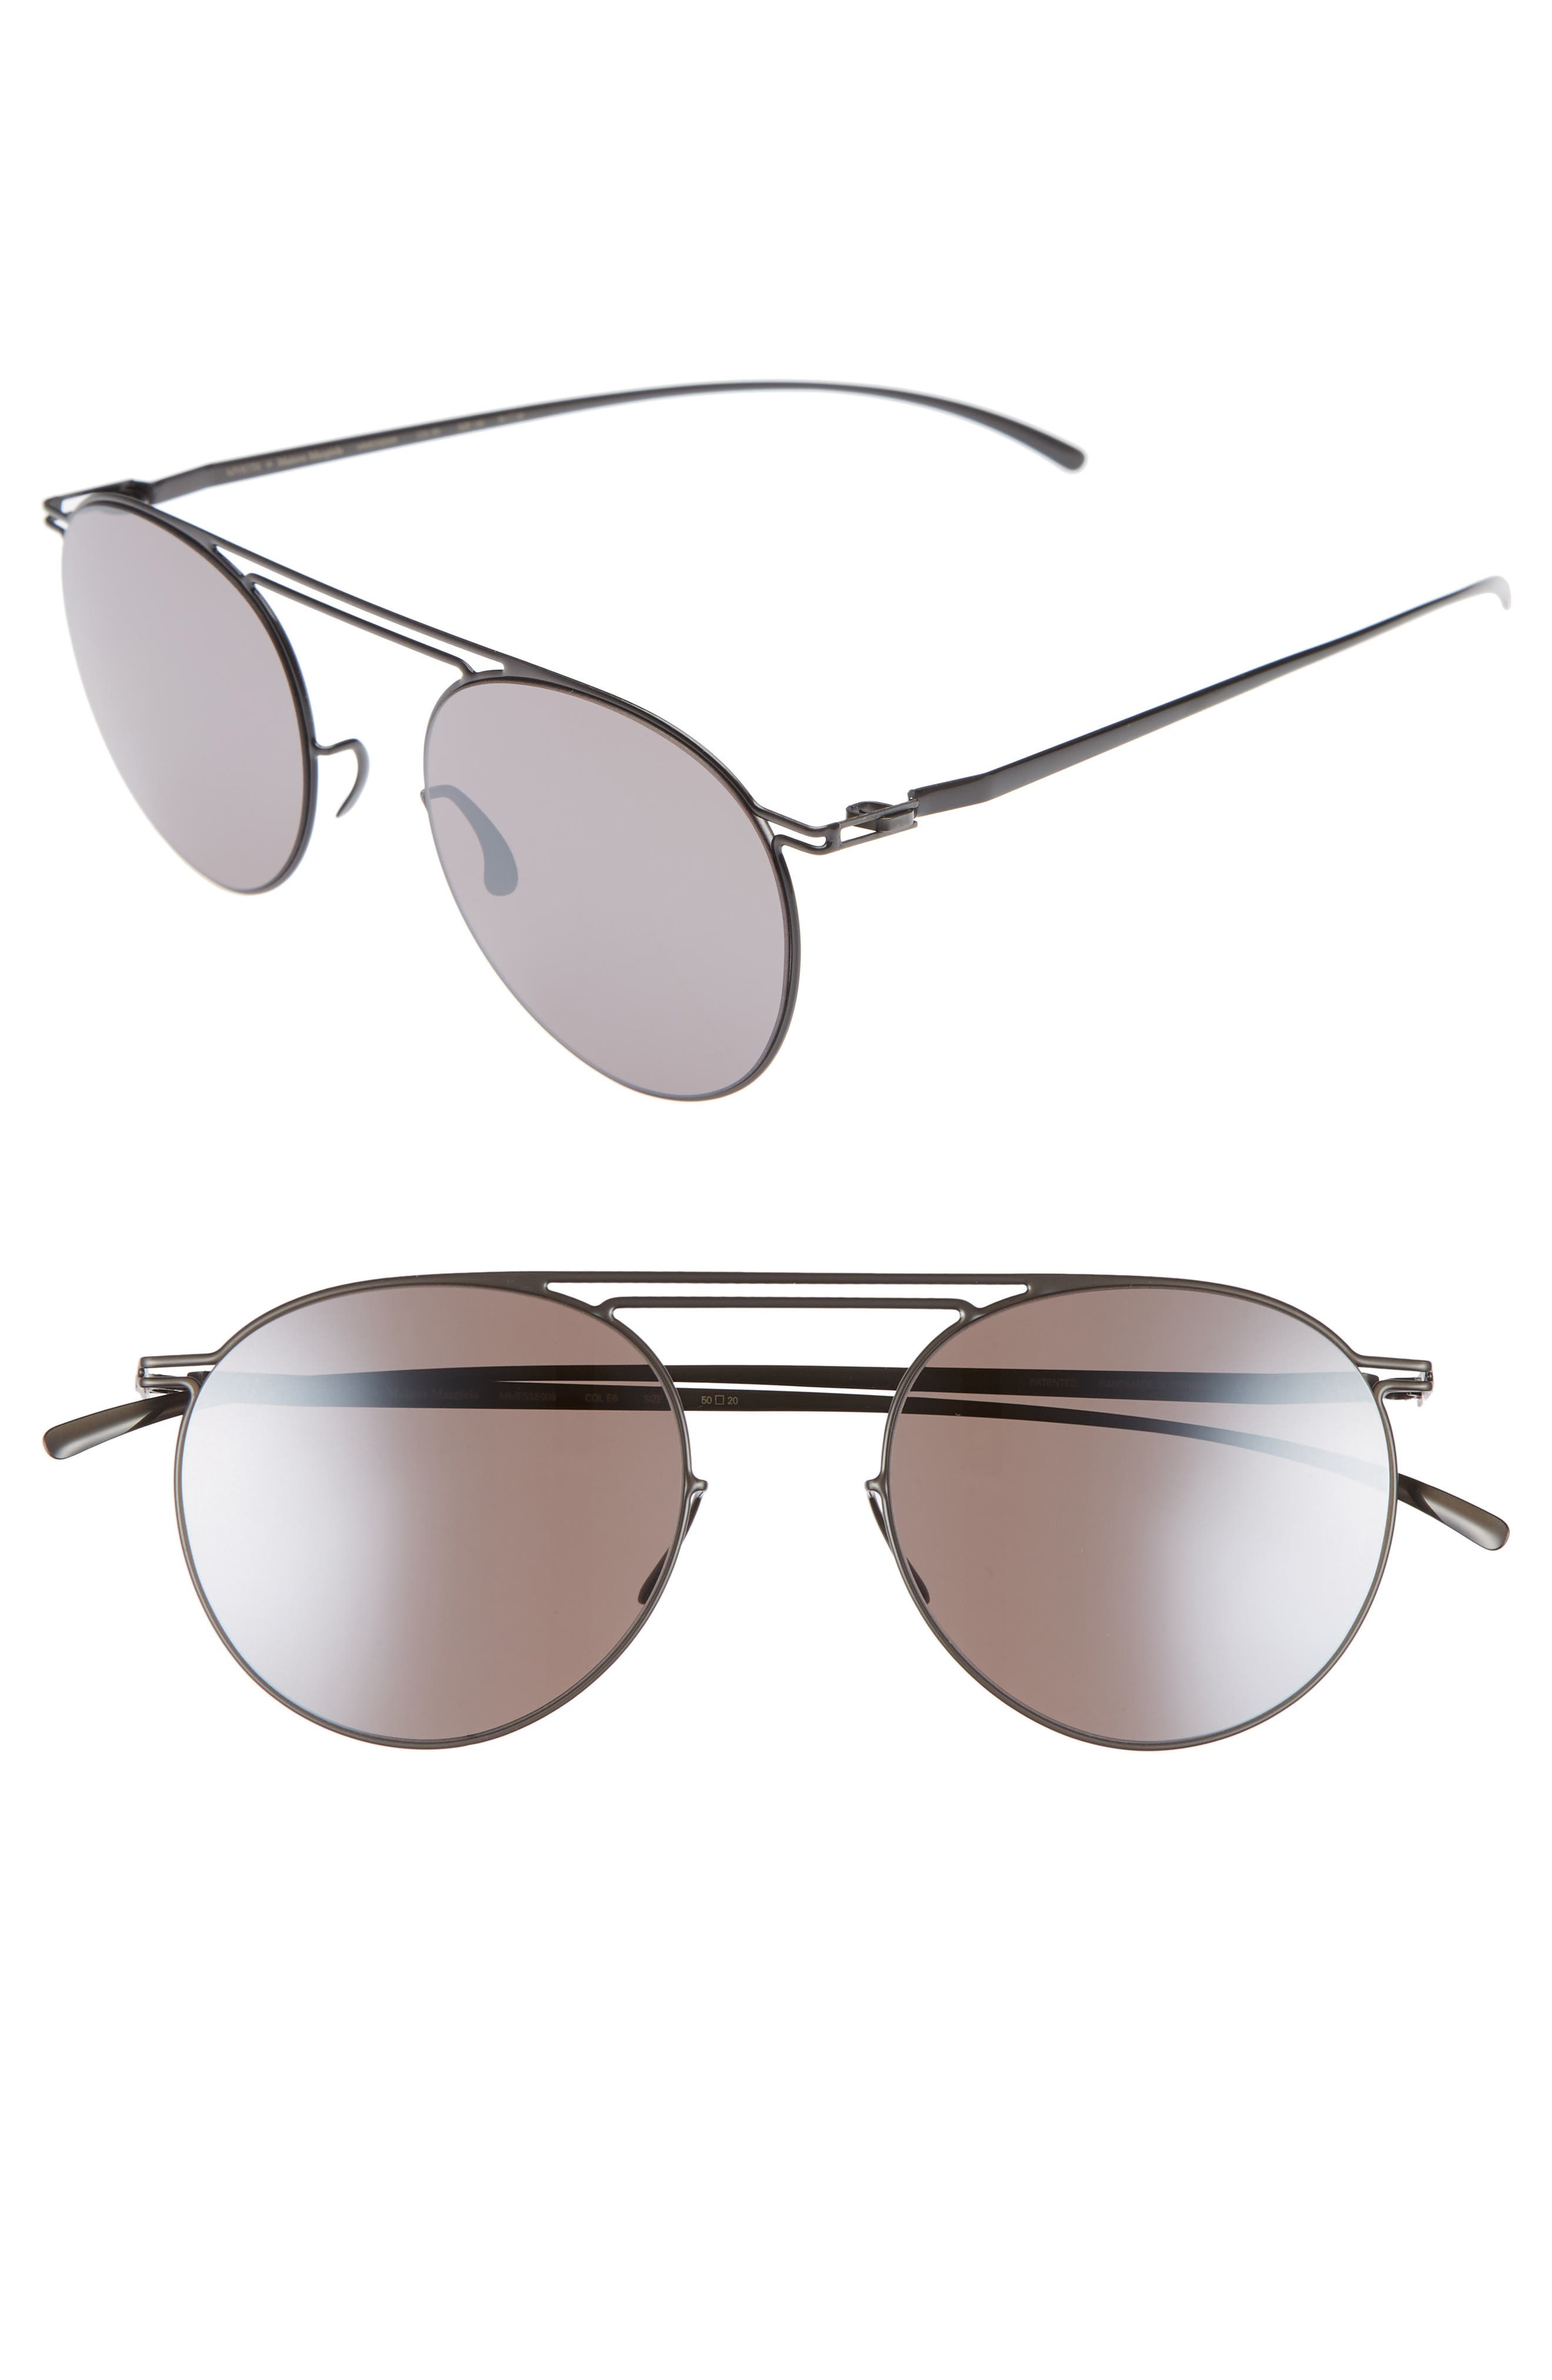 MMESSE009 50mm Sunglasses,                             Main thumbnail 1, color,